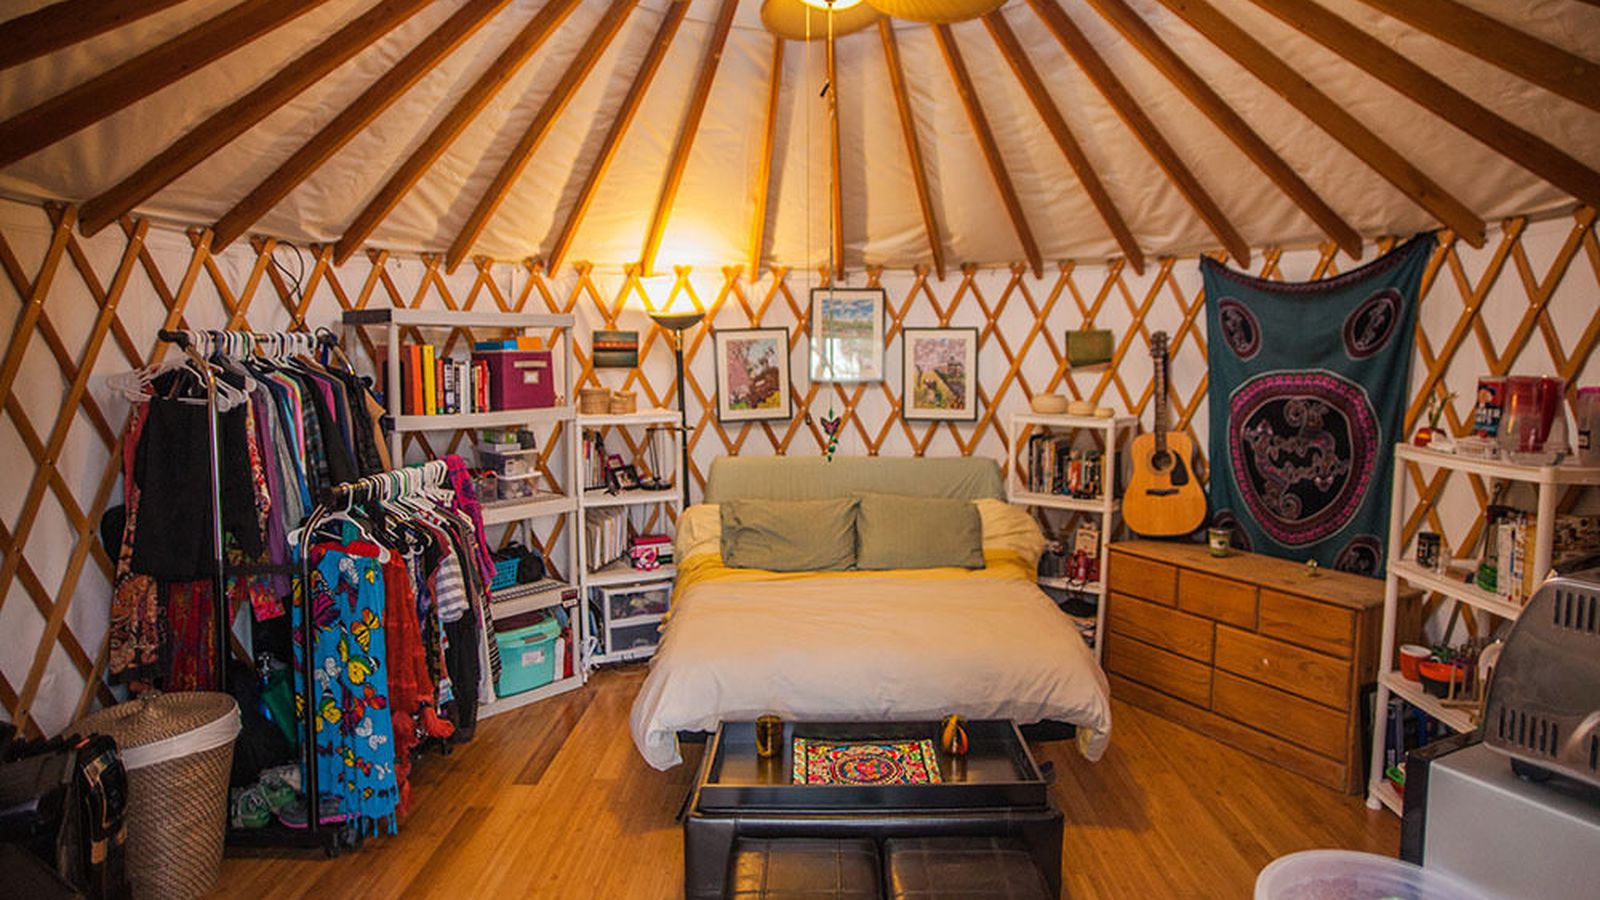 Hillside House With Backyard Yurt Asks 599k In Highland